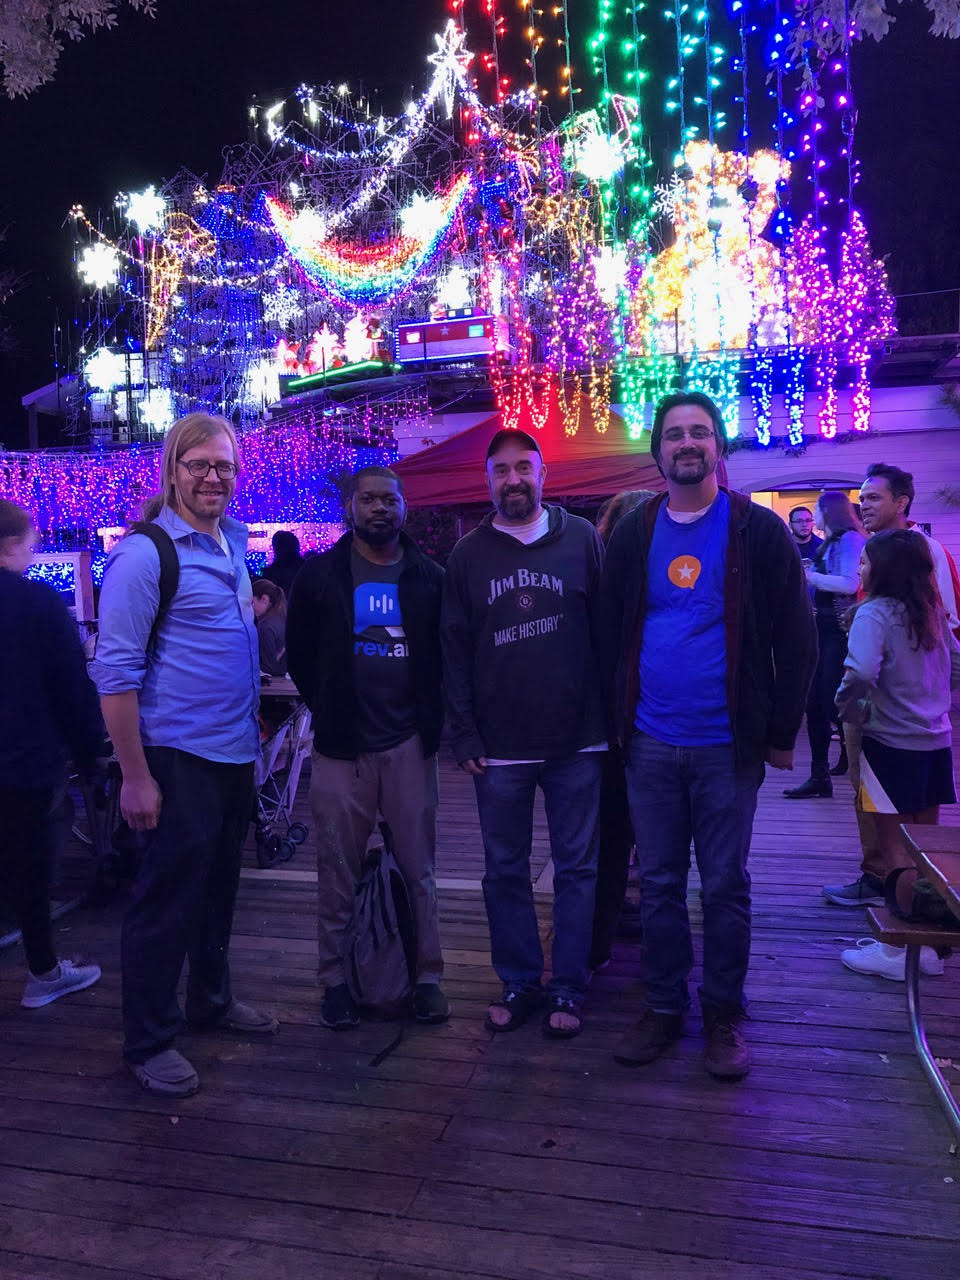 John, Cornelius, Tom, and Manton at Mozart's Coffee, Austin, TX 2019-12-04